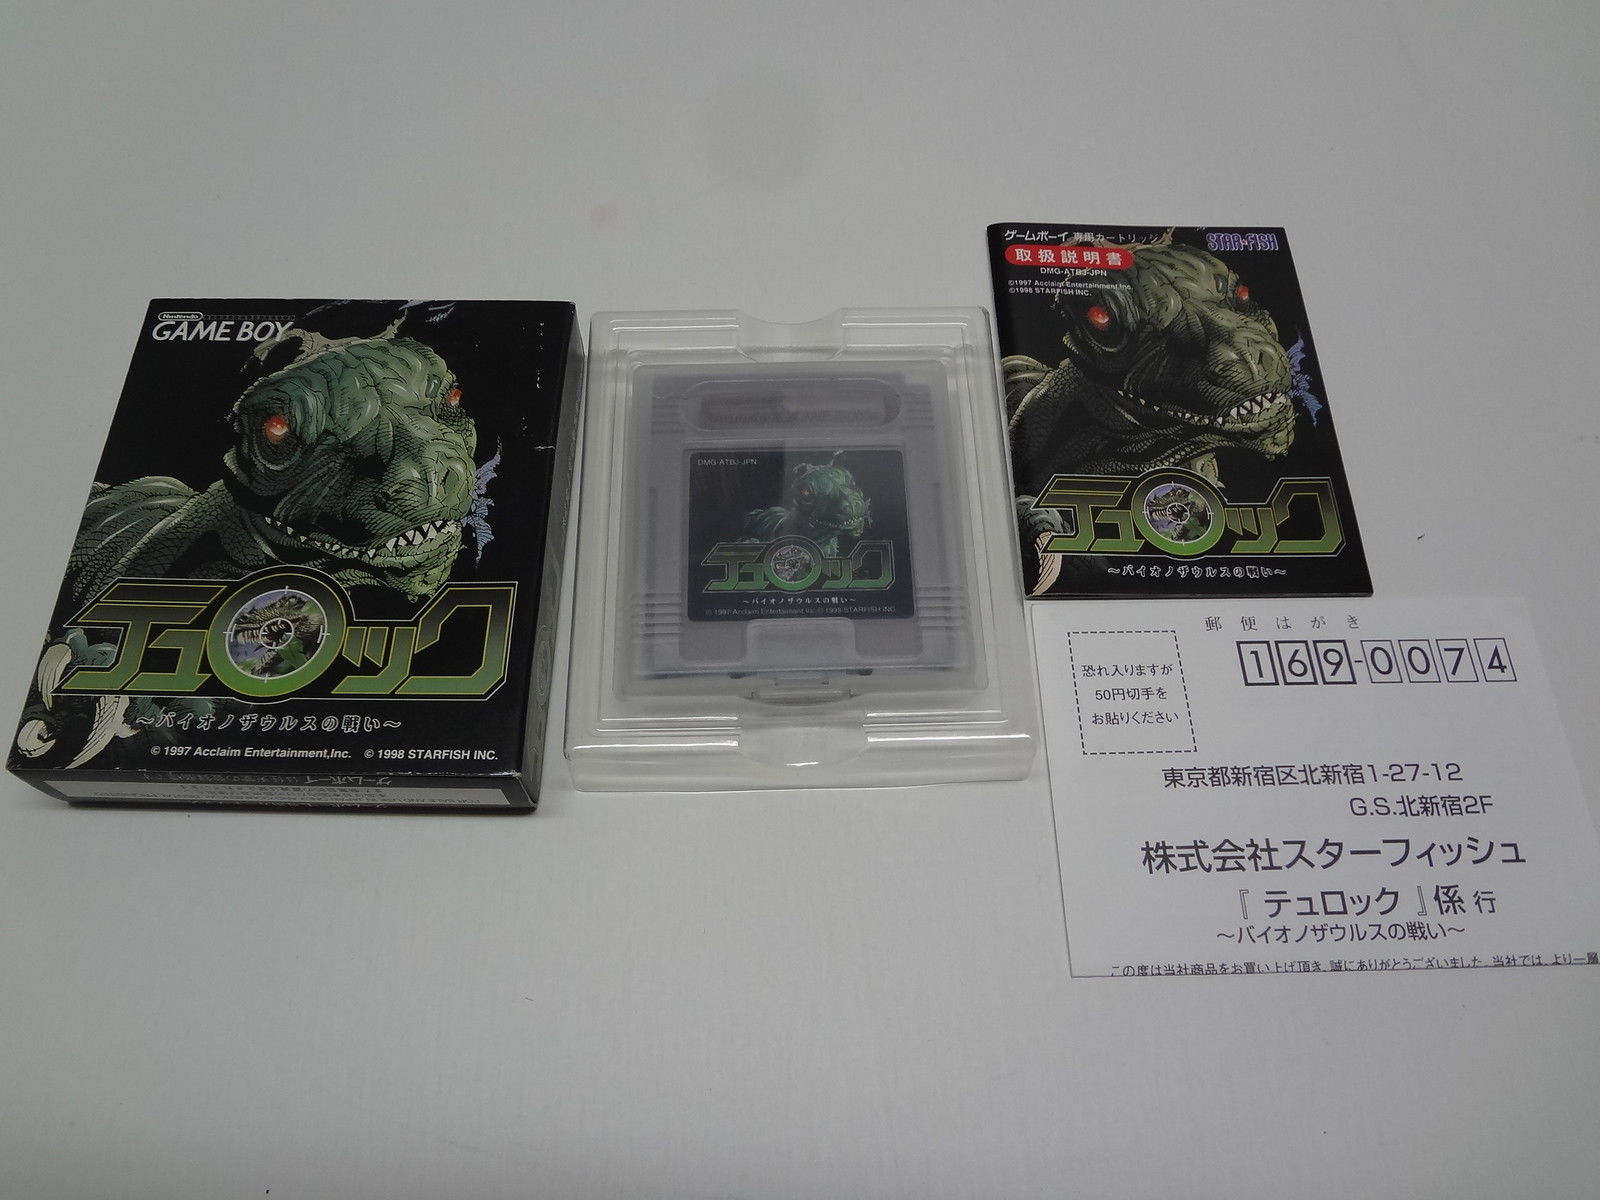 Game boy color japan - Turok Dinosaur Hunter Gameboy Color Japan Box 3 Jpg